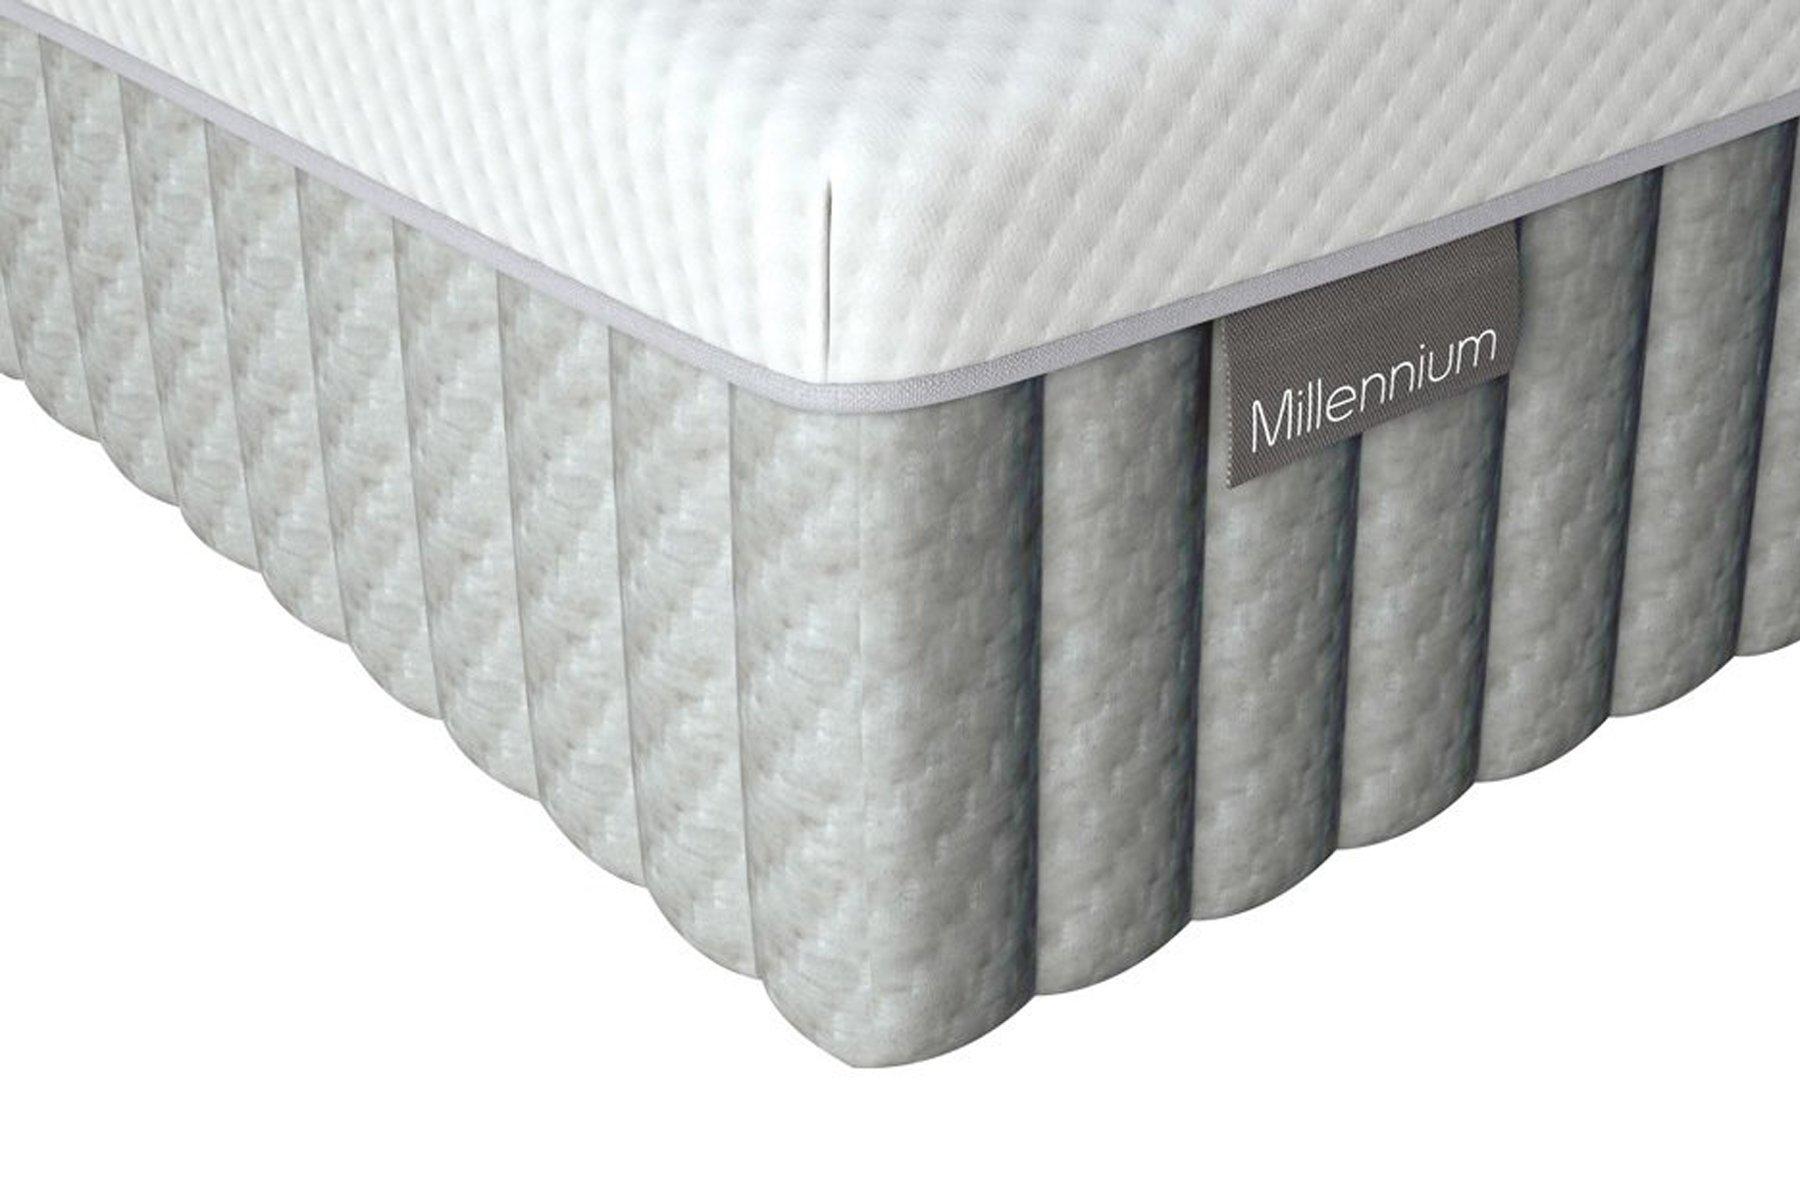 Dunlopillo Millennium Mattress 5ft King Buy Online In Trinidad And Tobago At Desertcart